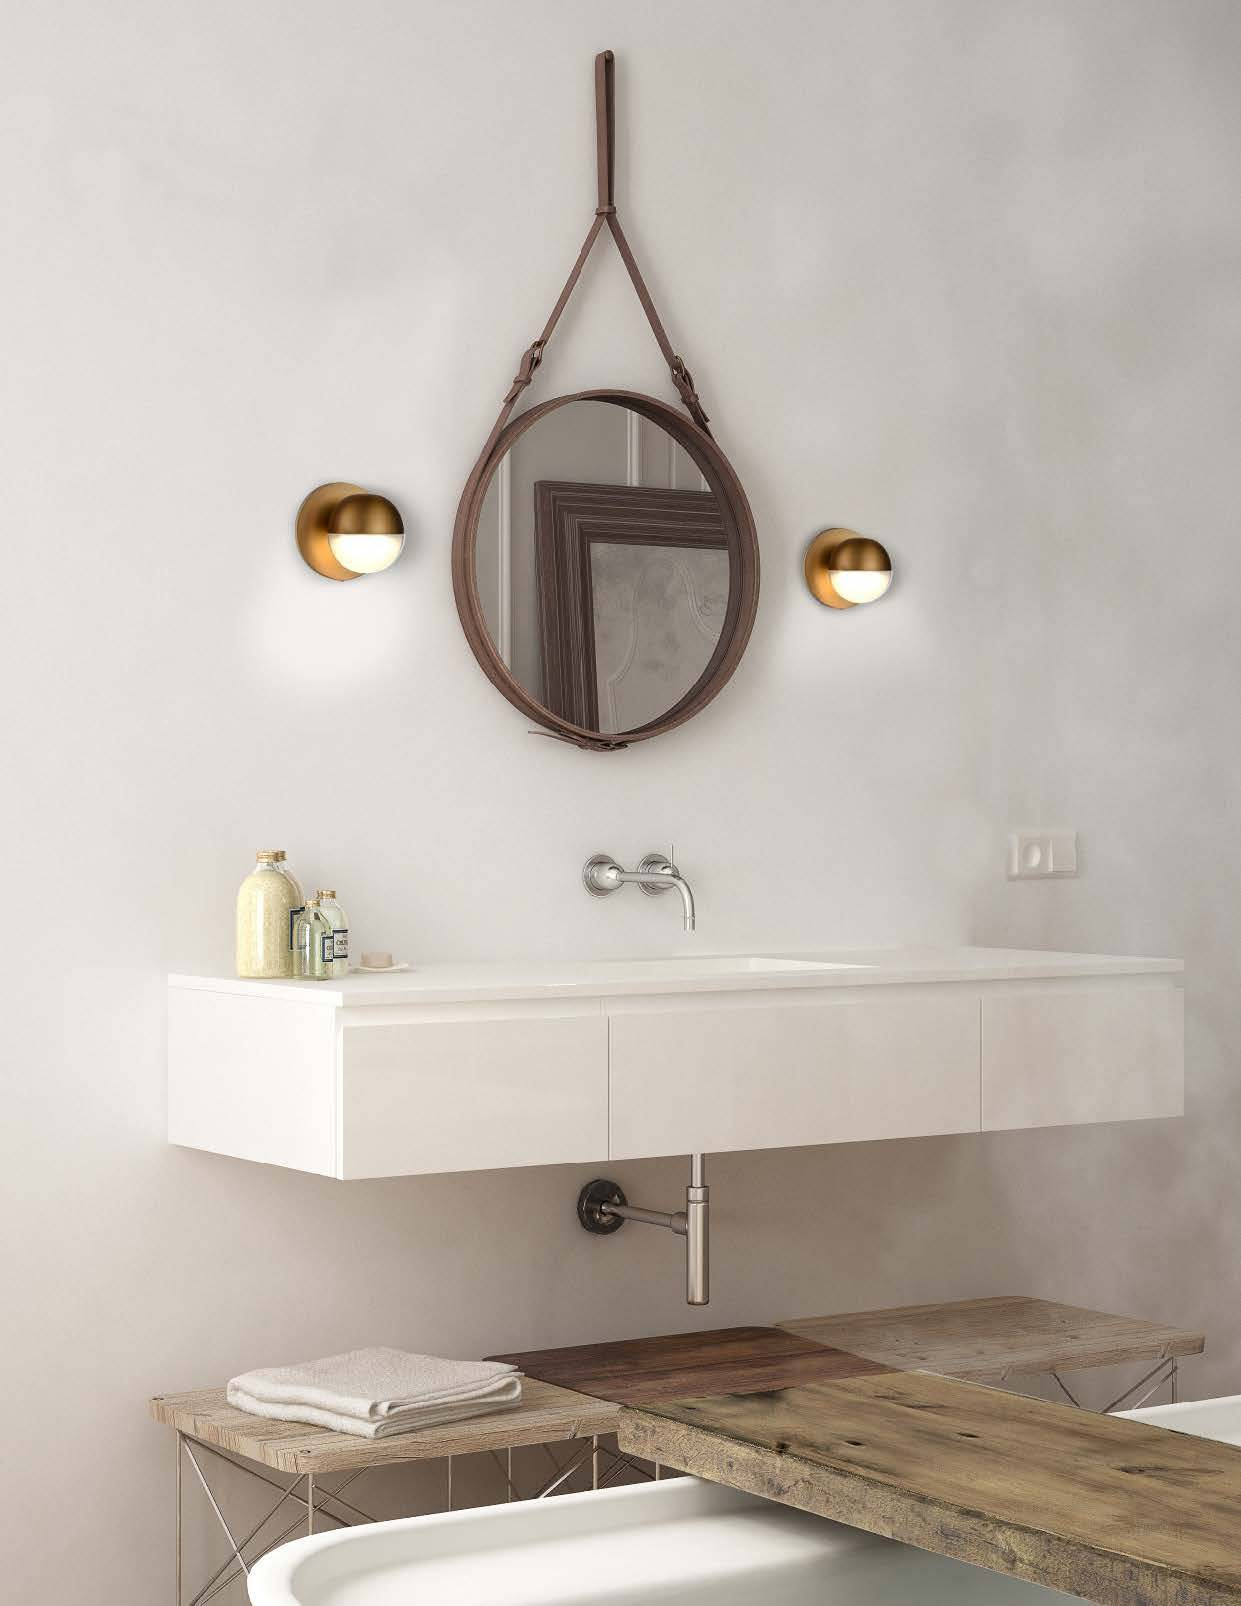 Kuzco Pluto Bath and Vanity Collection Bathroom Lighting